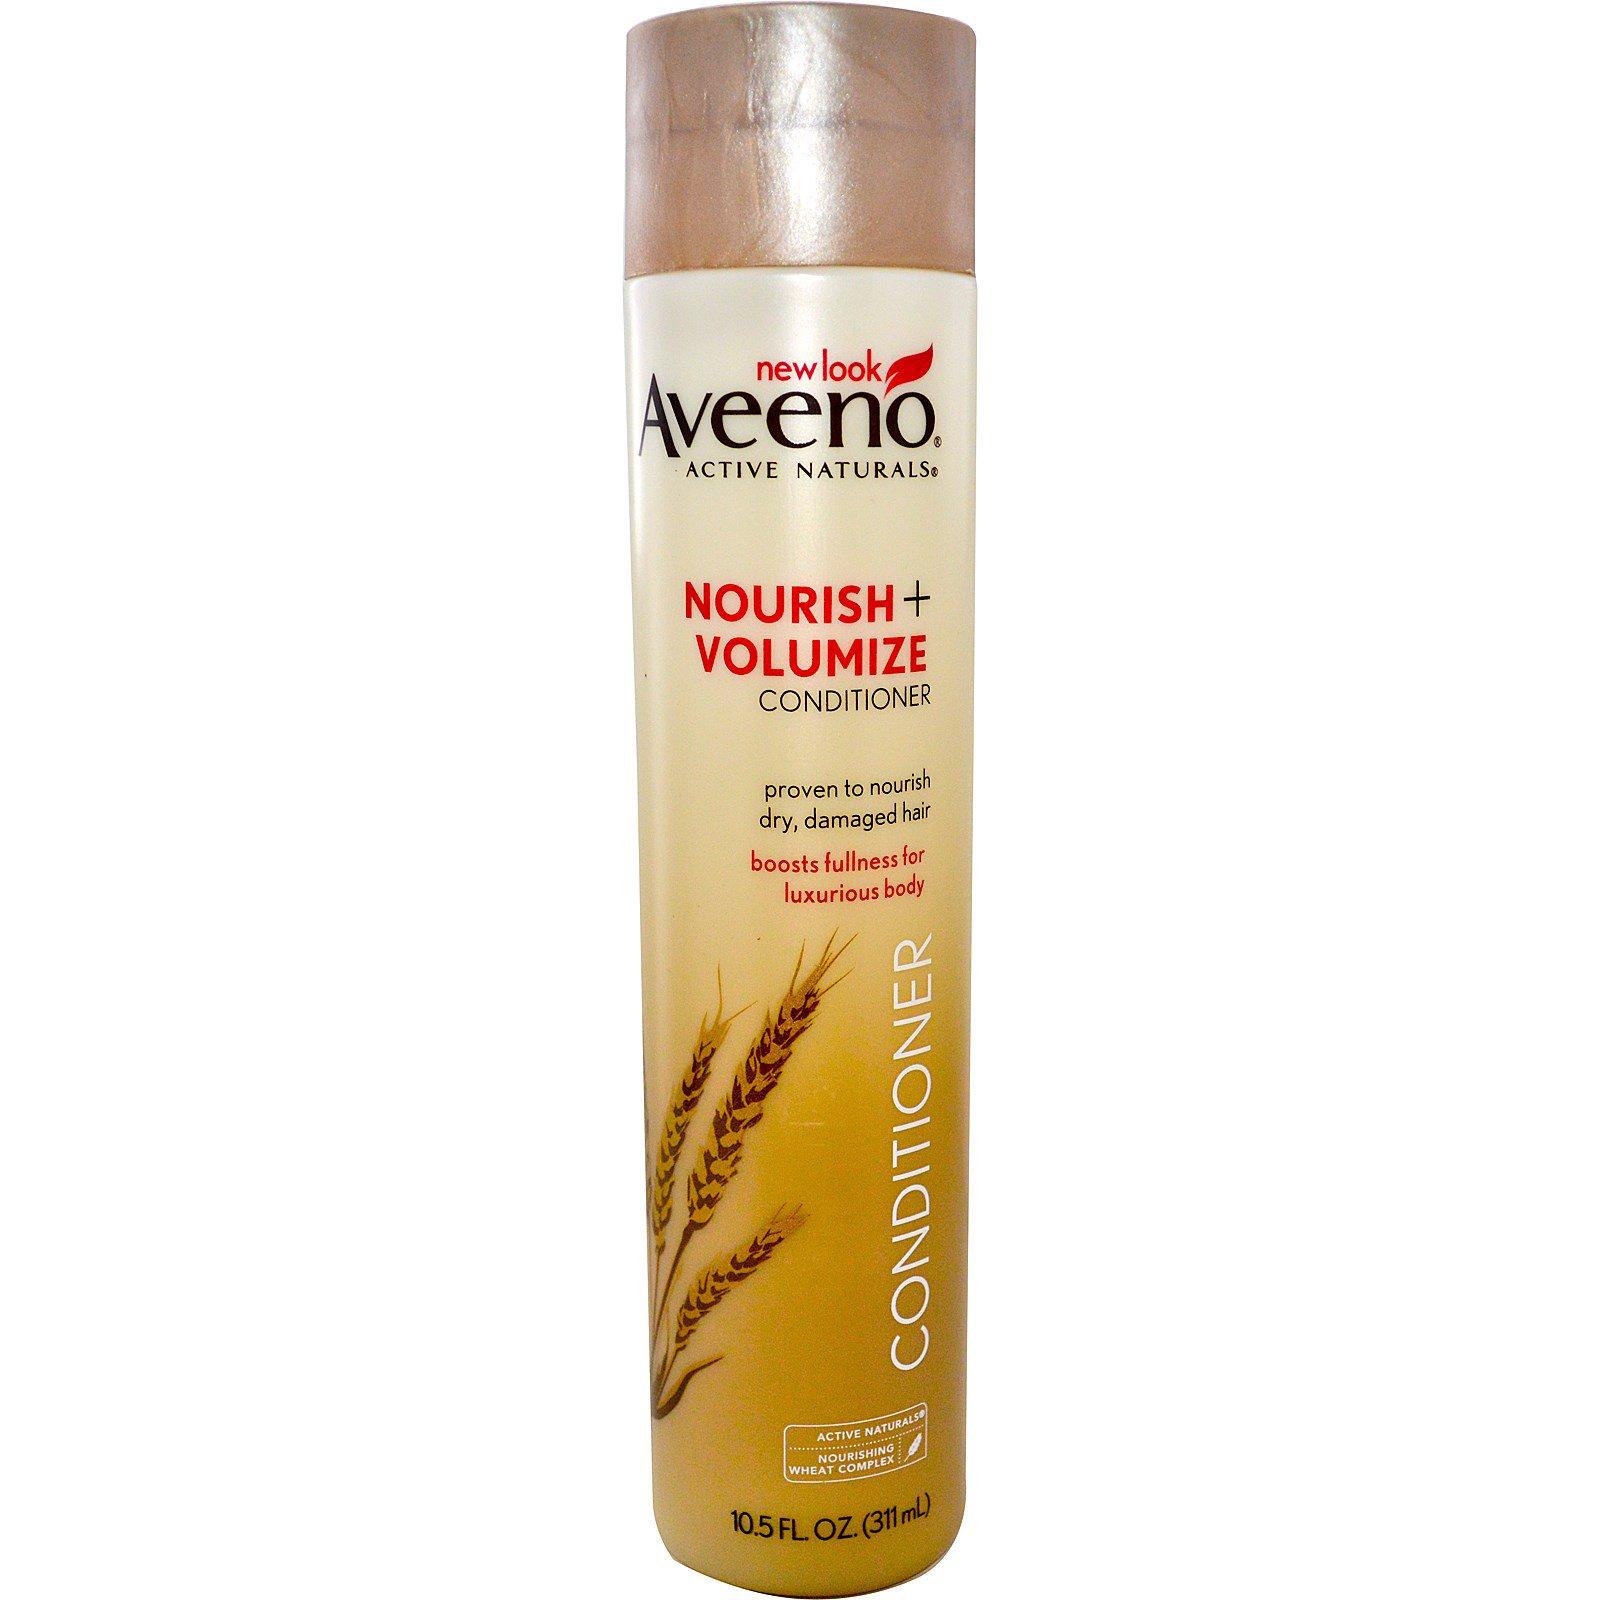 Aveeno, Active Naturals, Nourish+, Volumize Conditioner, 10.5 fl oz